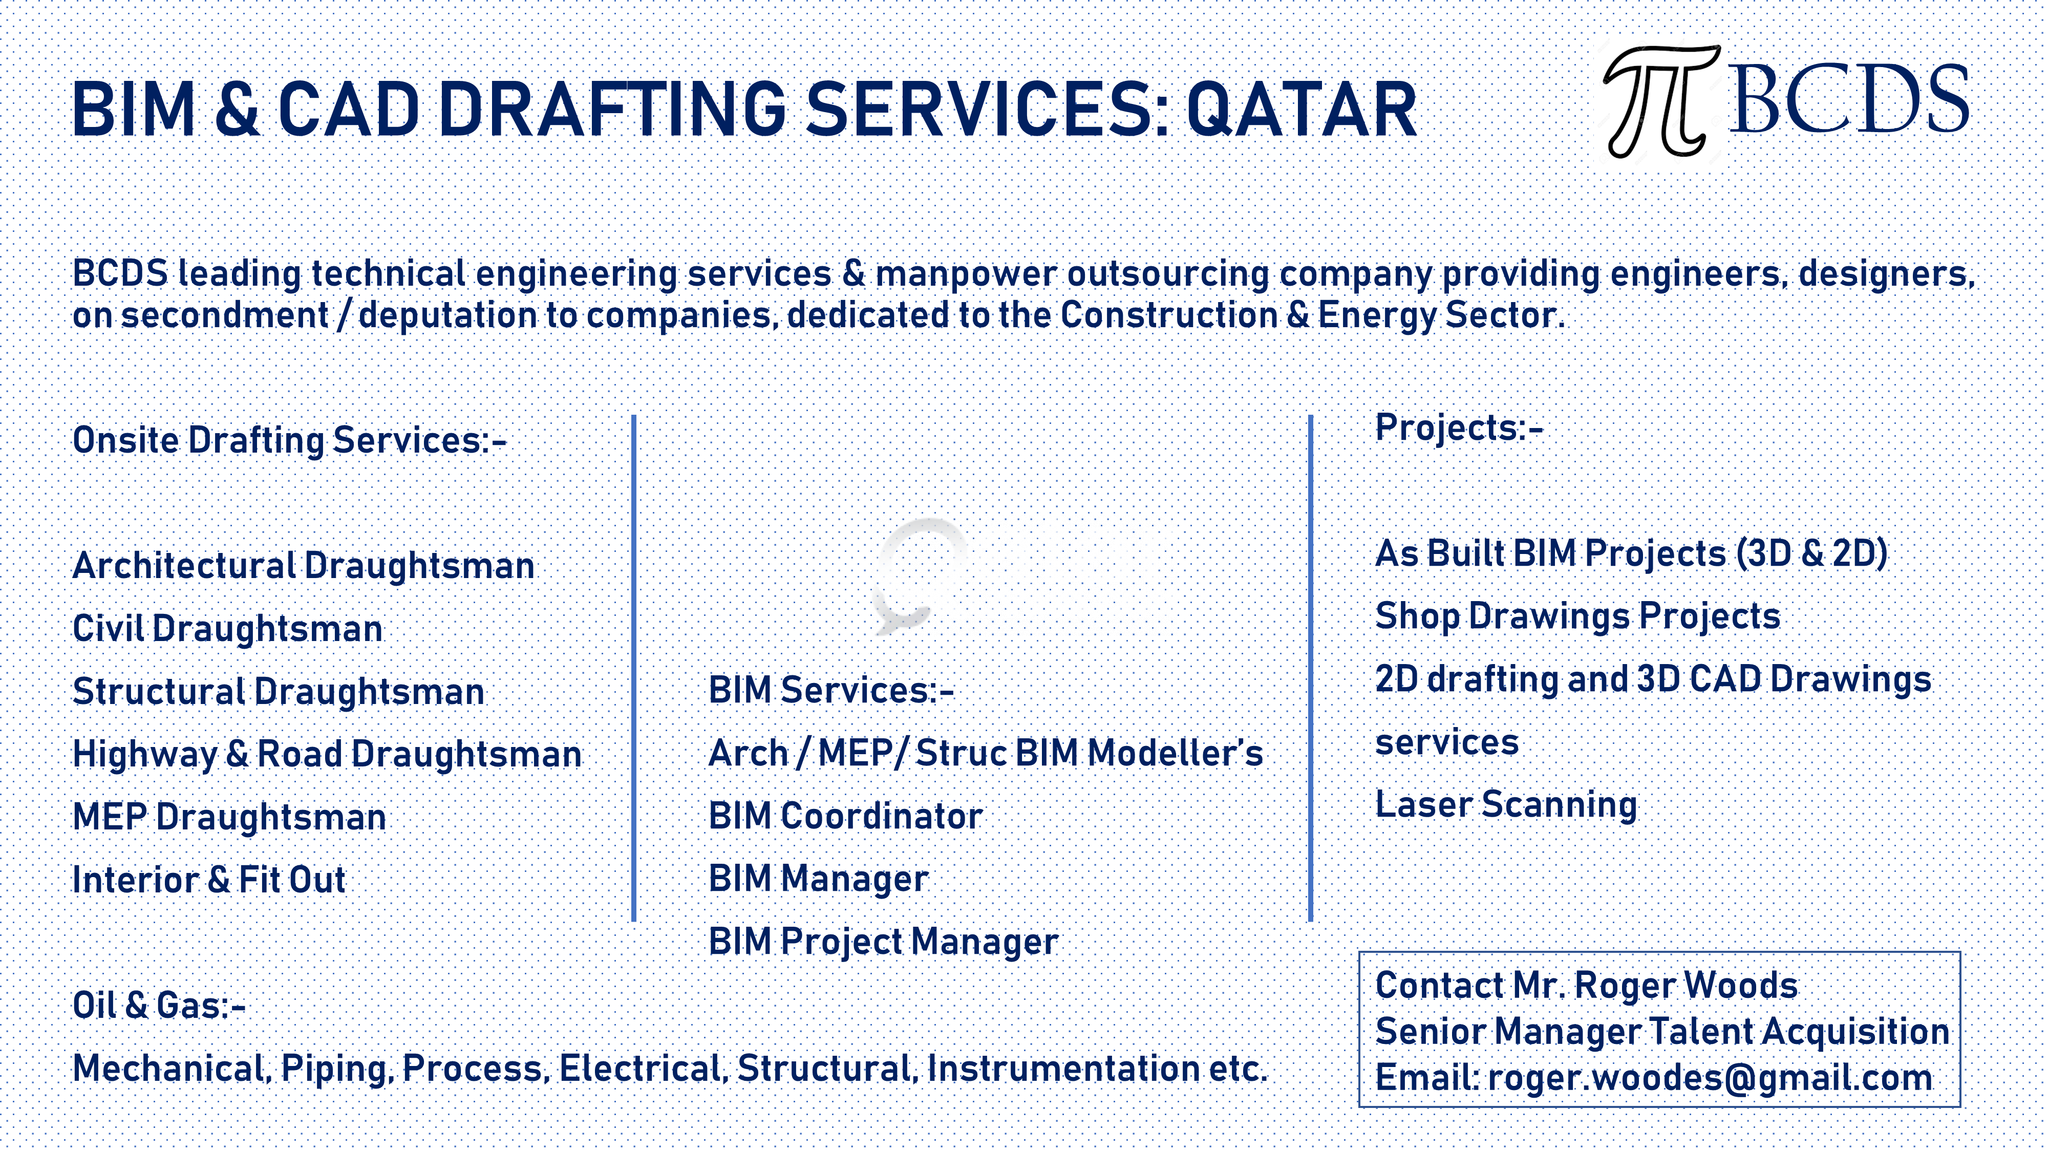 BIM & CAD DRAFTING SERVICES: QATAR | Qatar Living